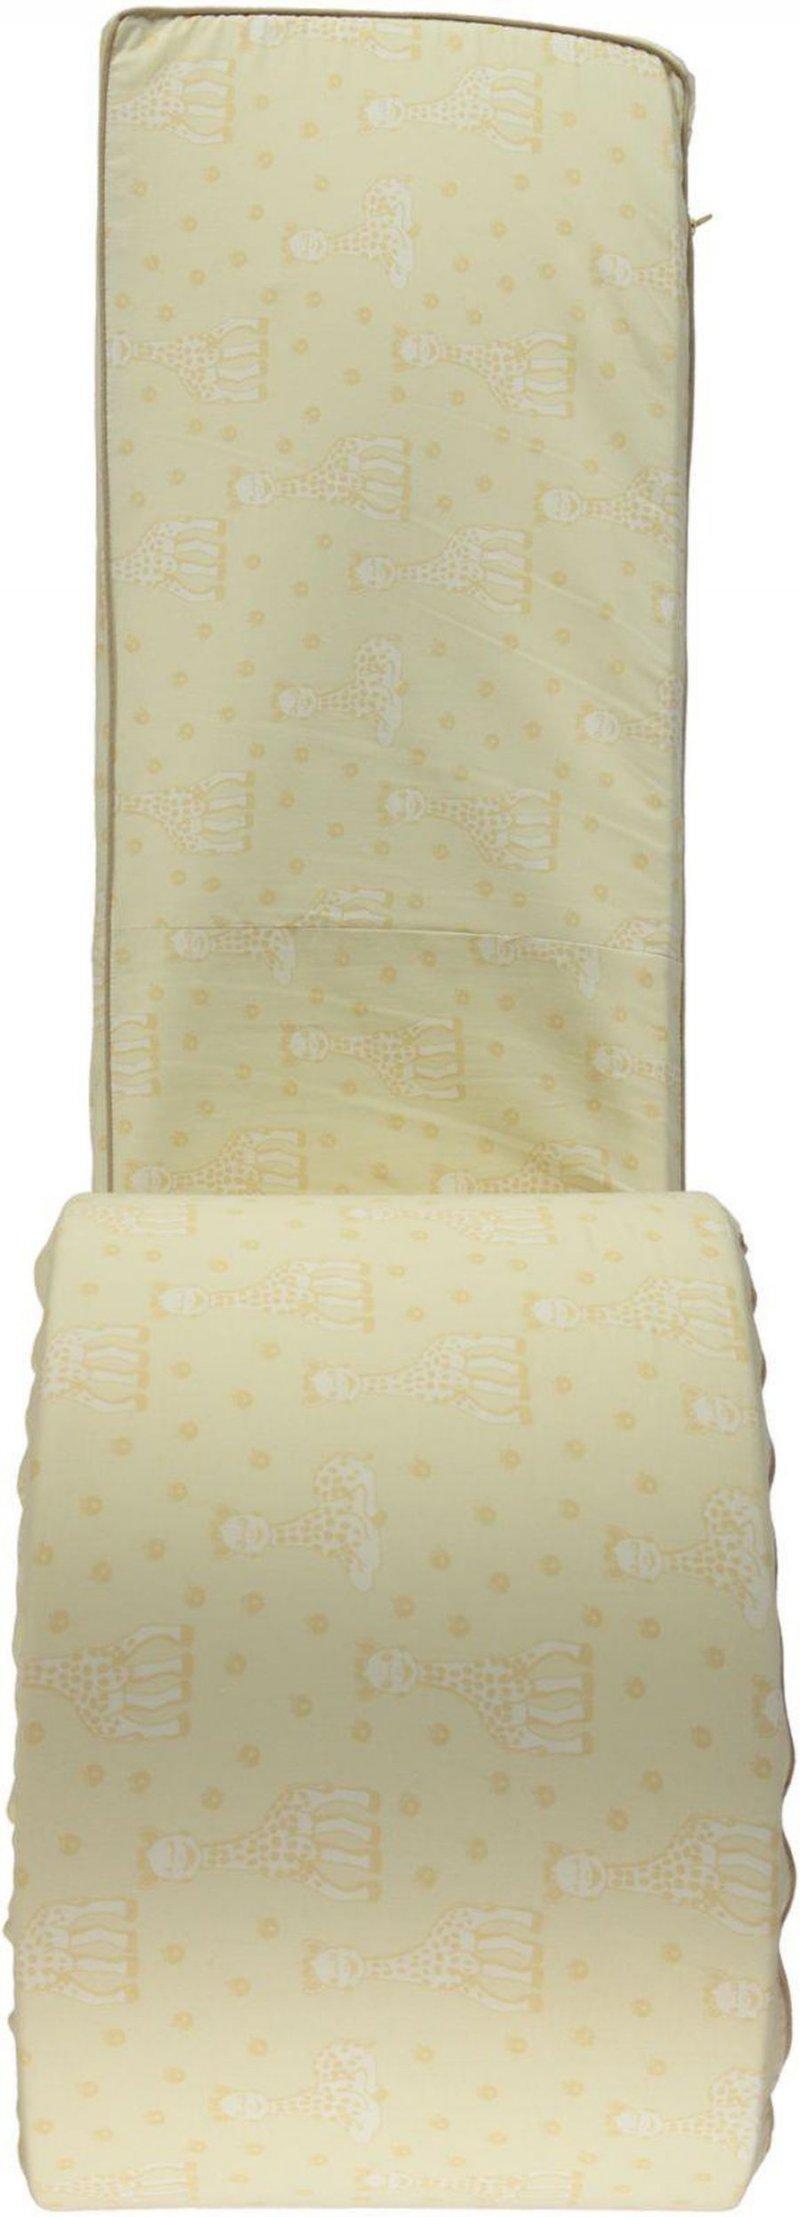 Småfolk - Sengerand M.  Sophie La Girafe Print - Frozen Dew